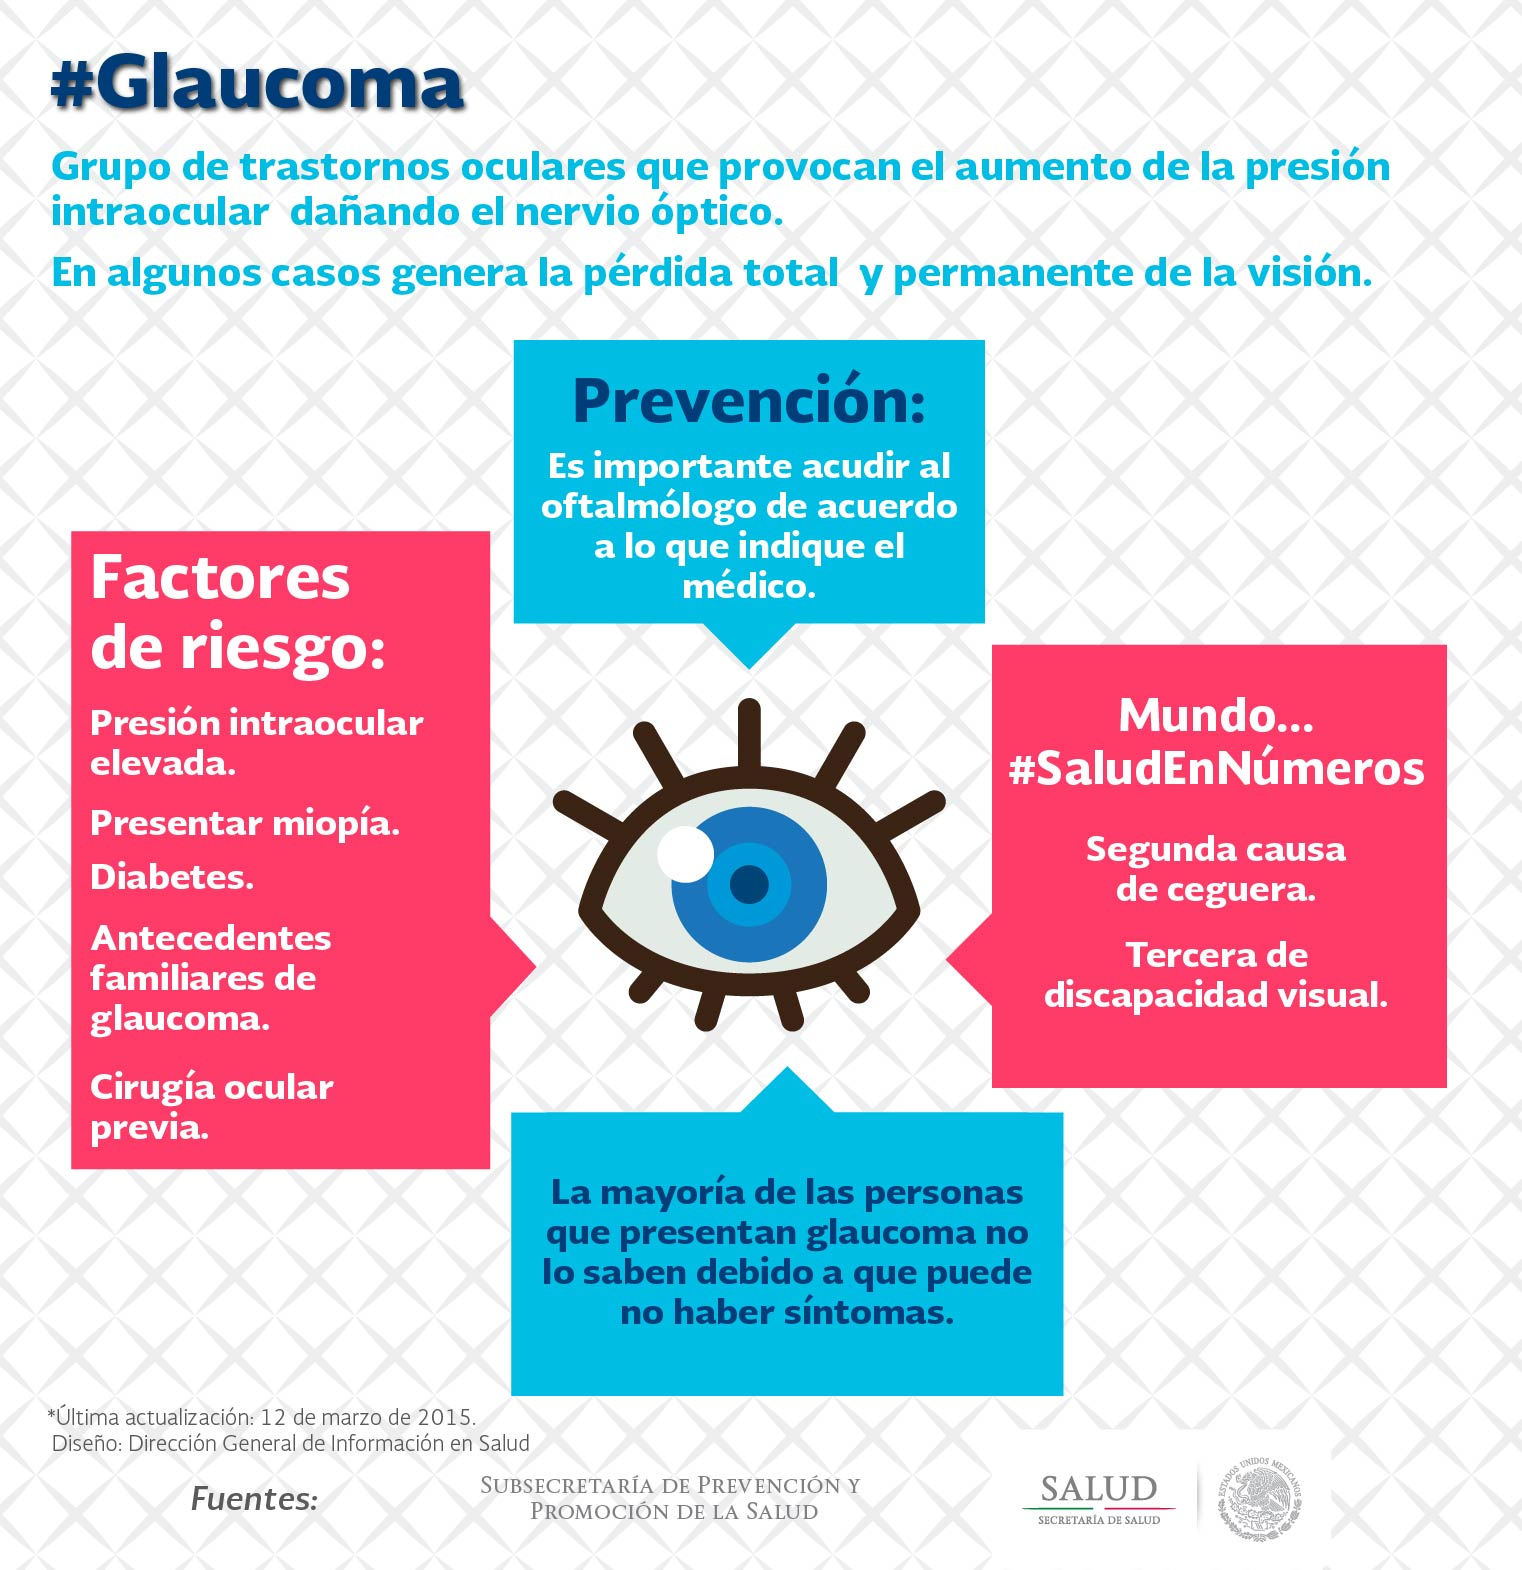 04Glaucomajpg